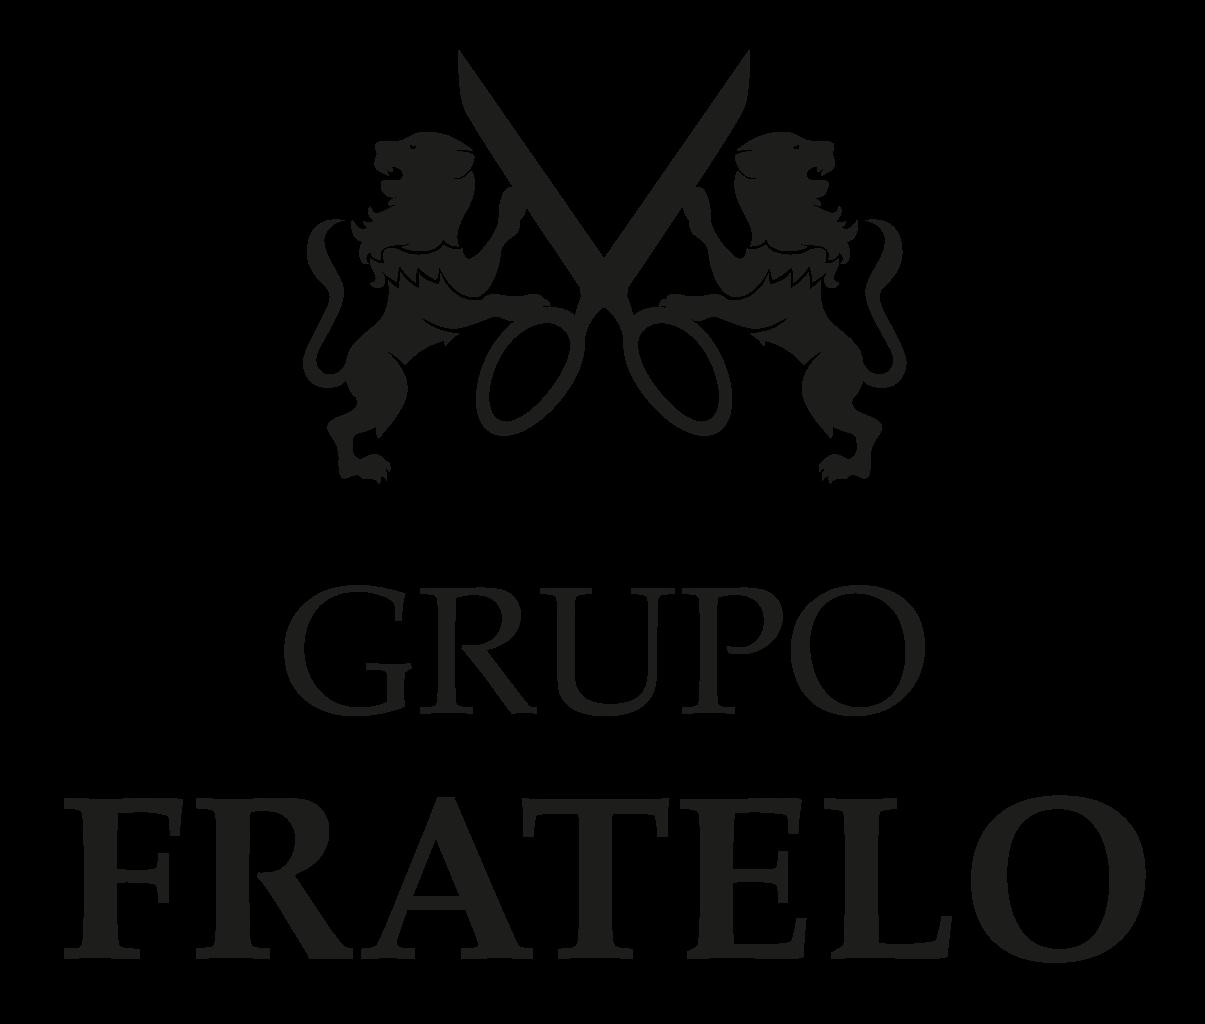 Grupo Fratelo